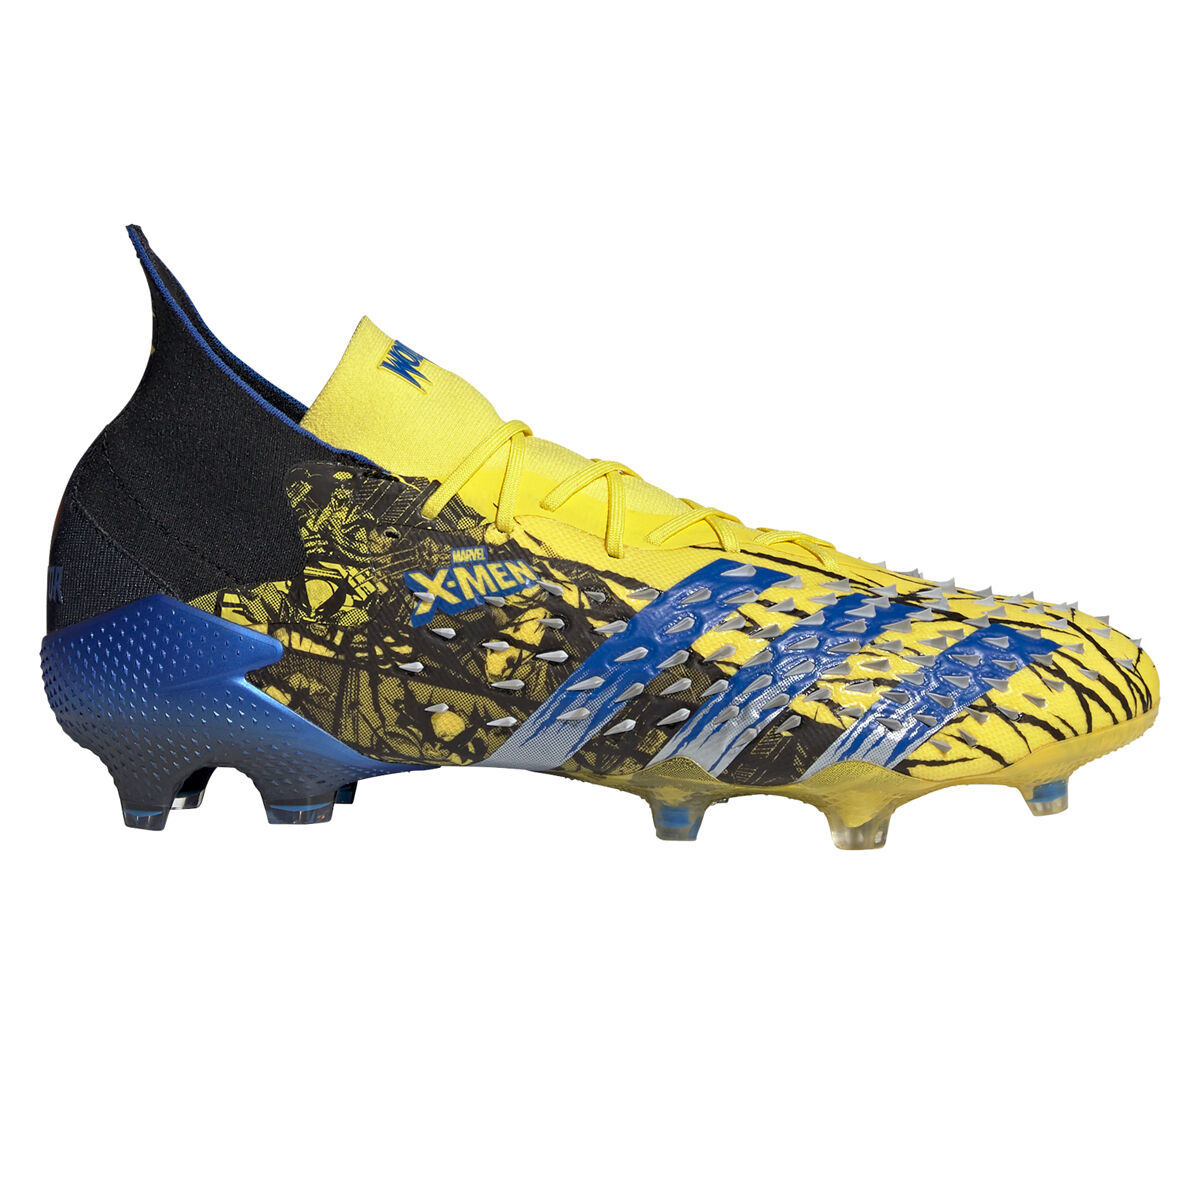 adidas zx 700 boat mammoth mountain   adidas x Marvel X-Men Predator Freak .1 Football Boots